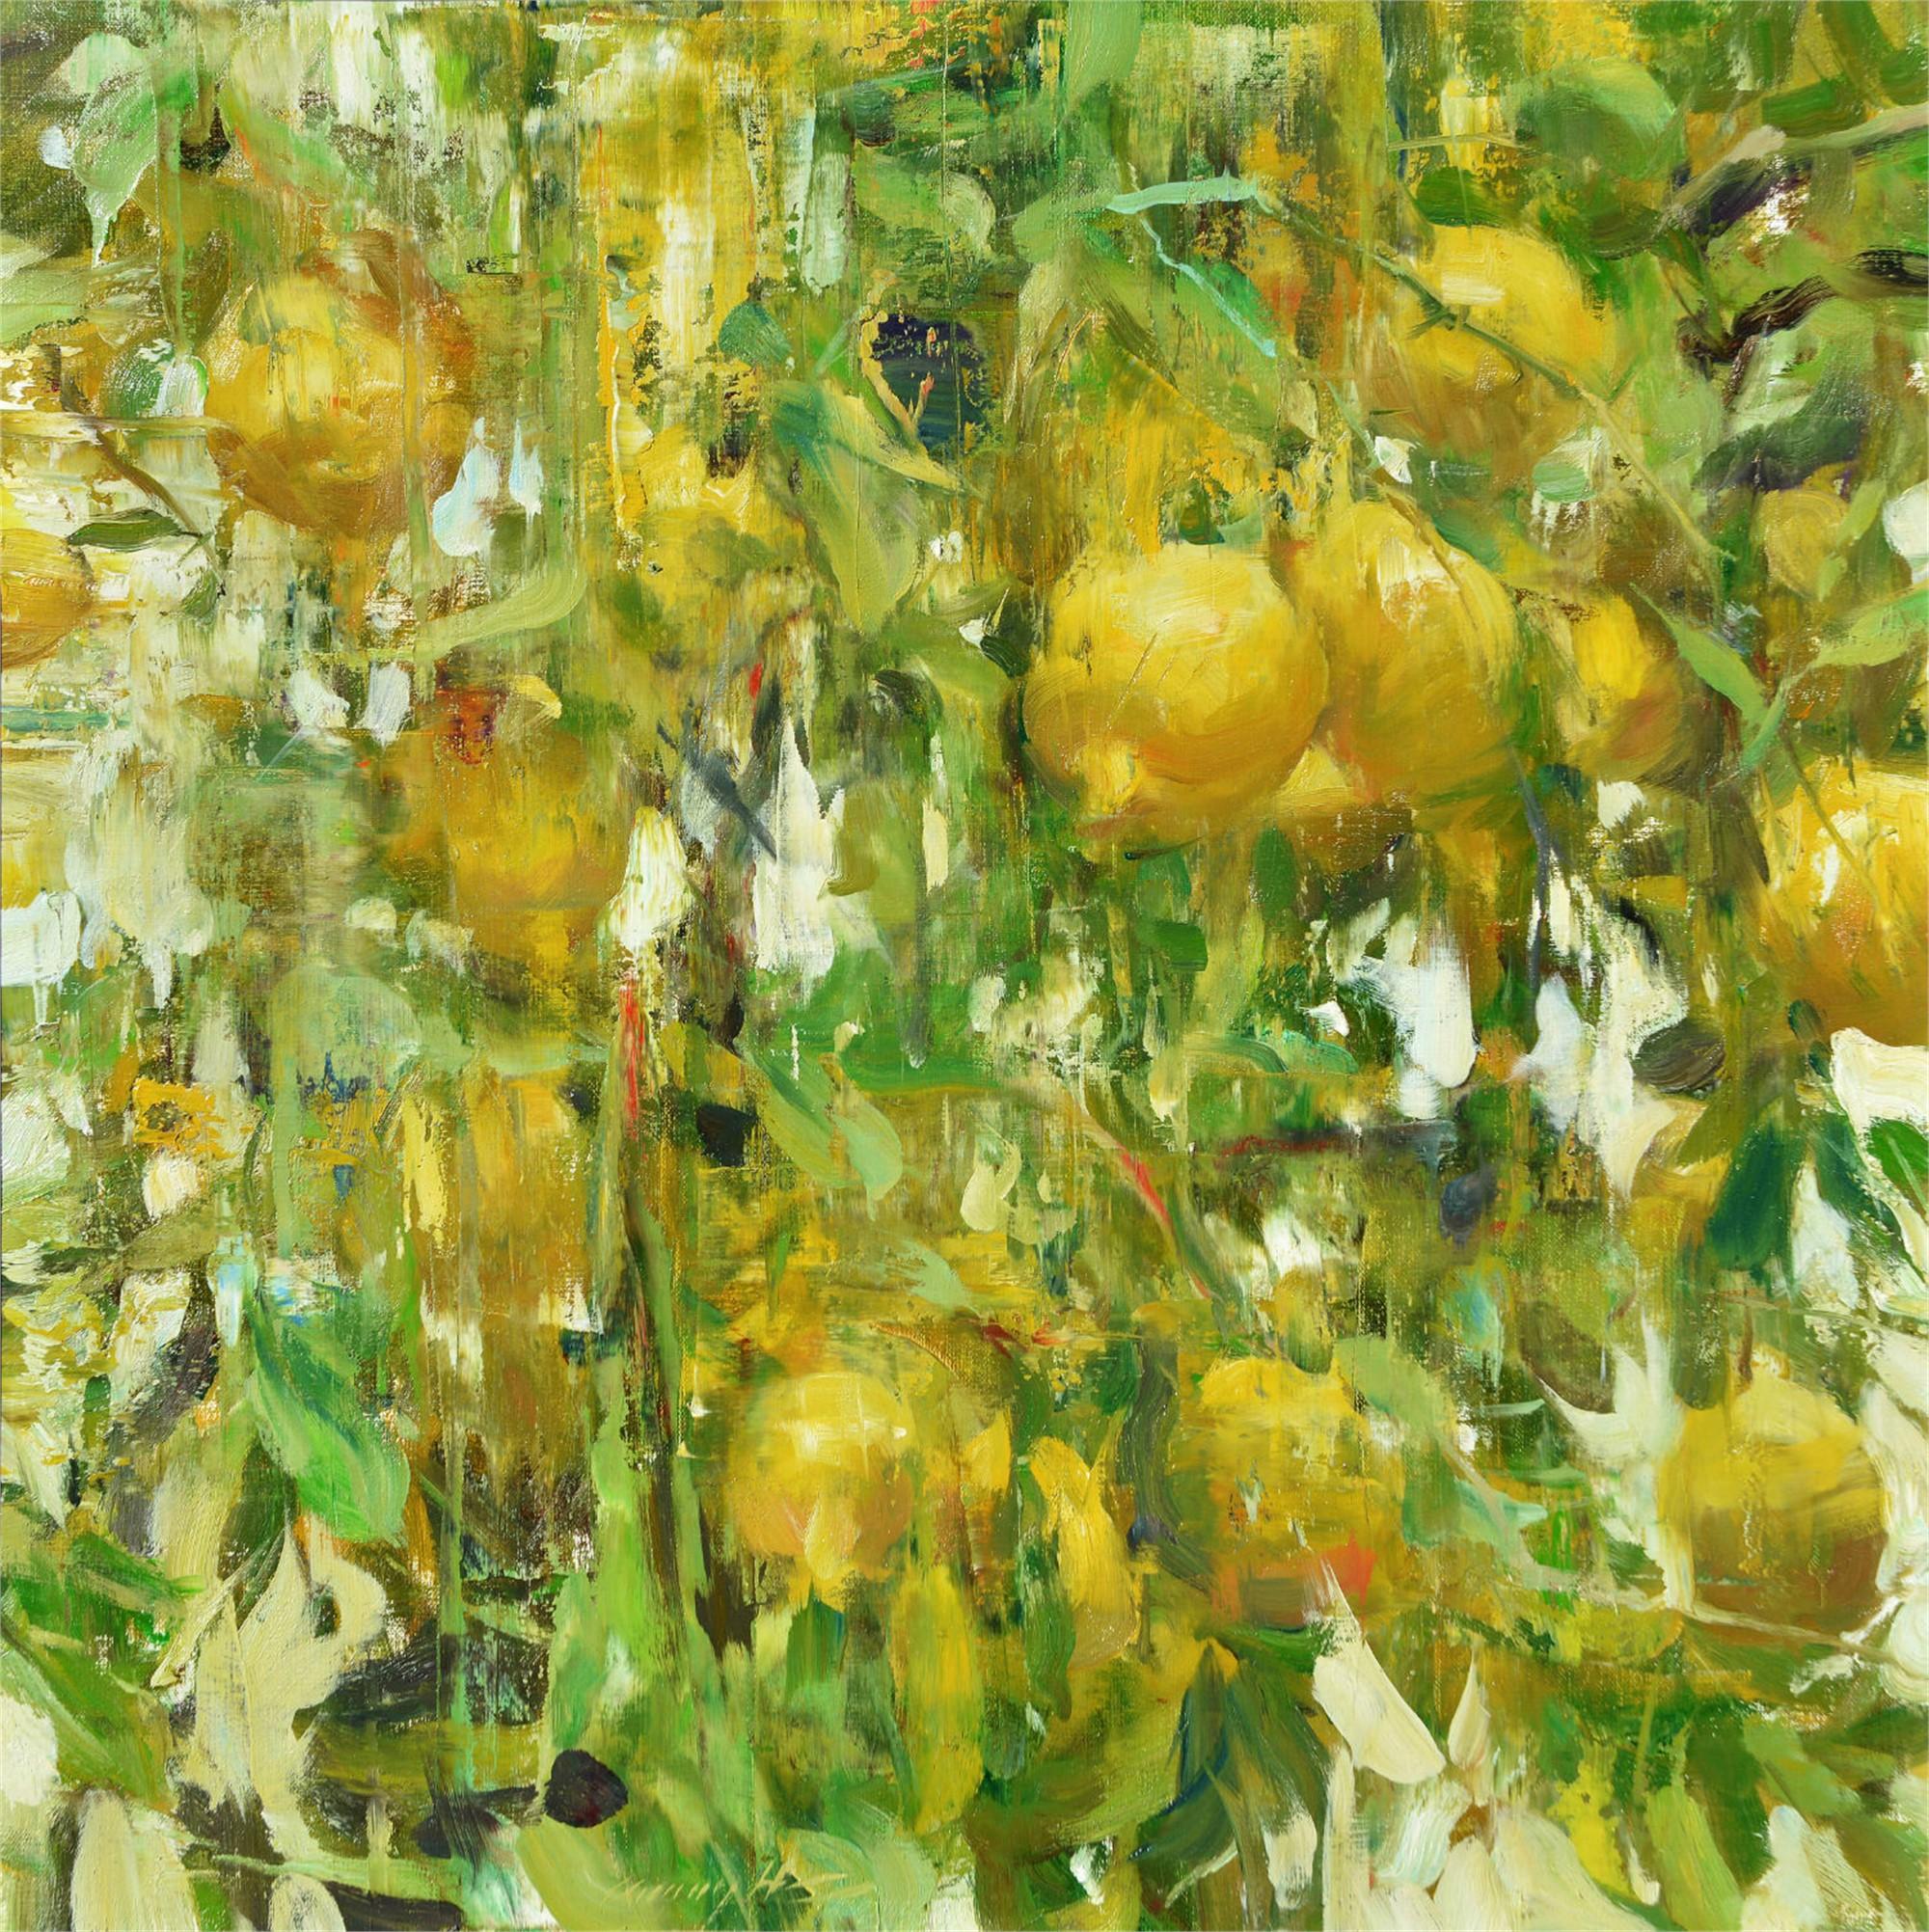 Lemon Trees by Quang Ho